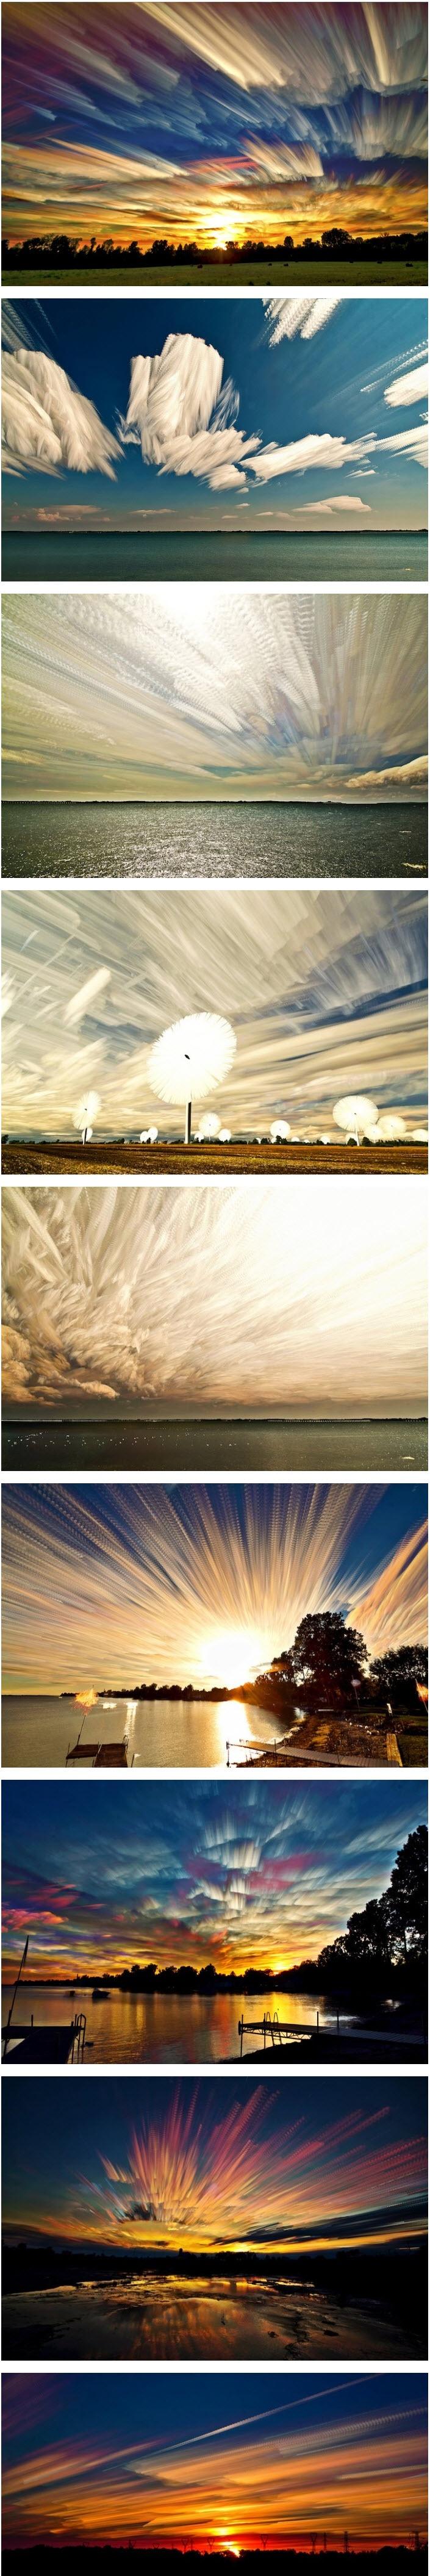 Matt Molloy Smeared Skys